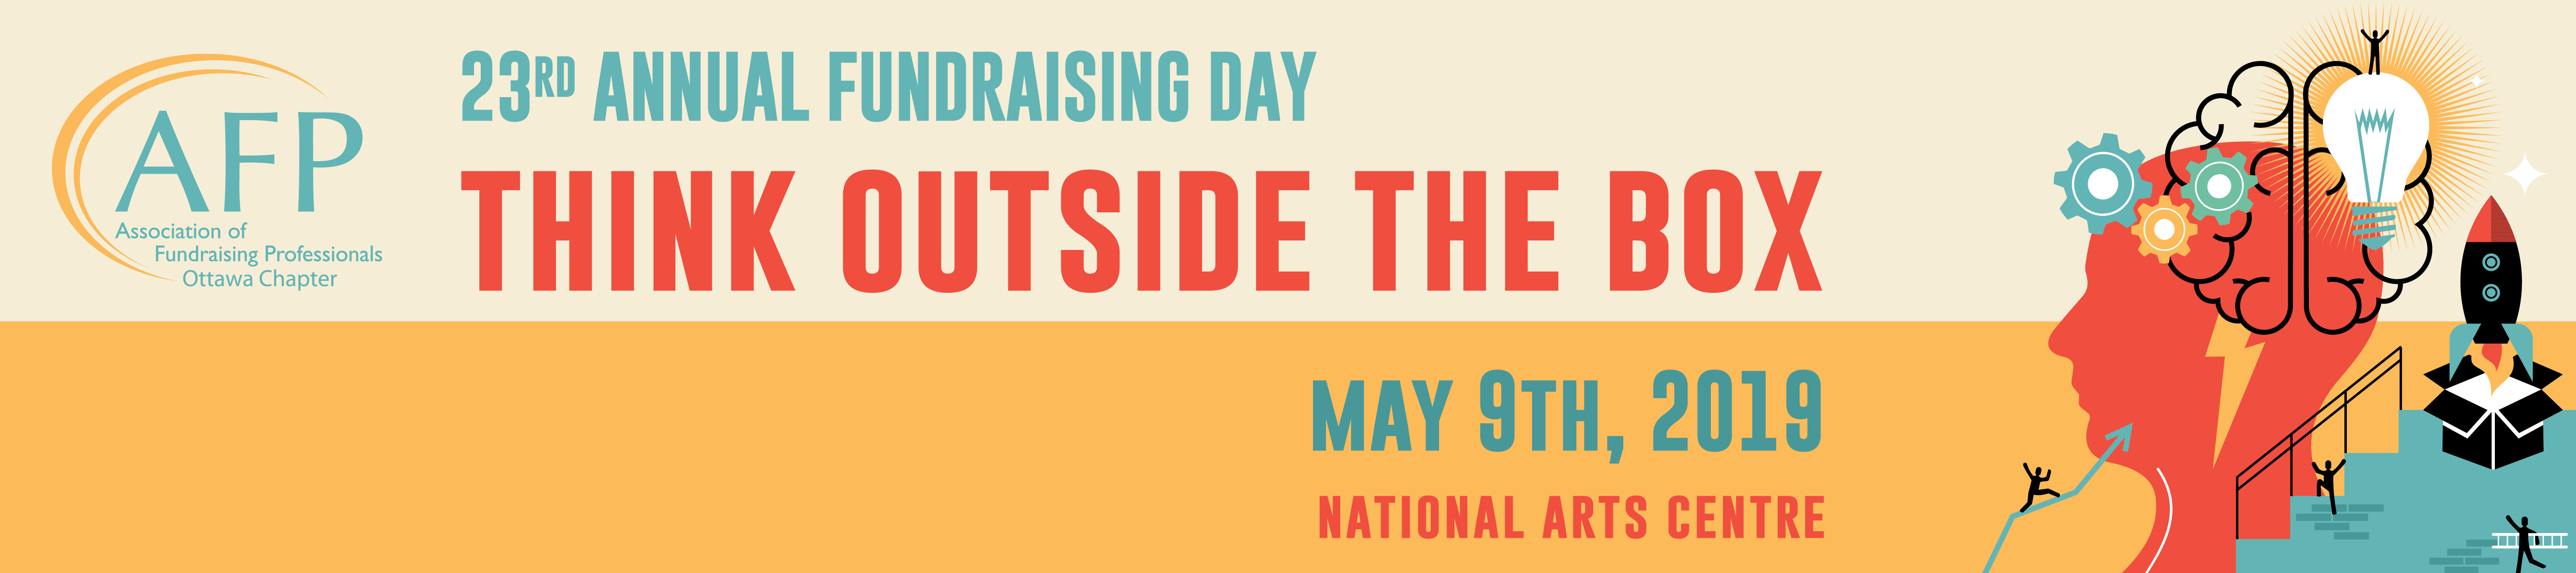 AFP Ottawa Fundraising Day, May 9, 2019